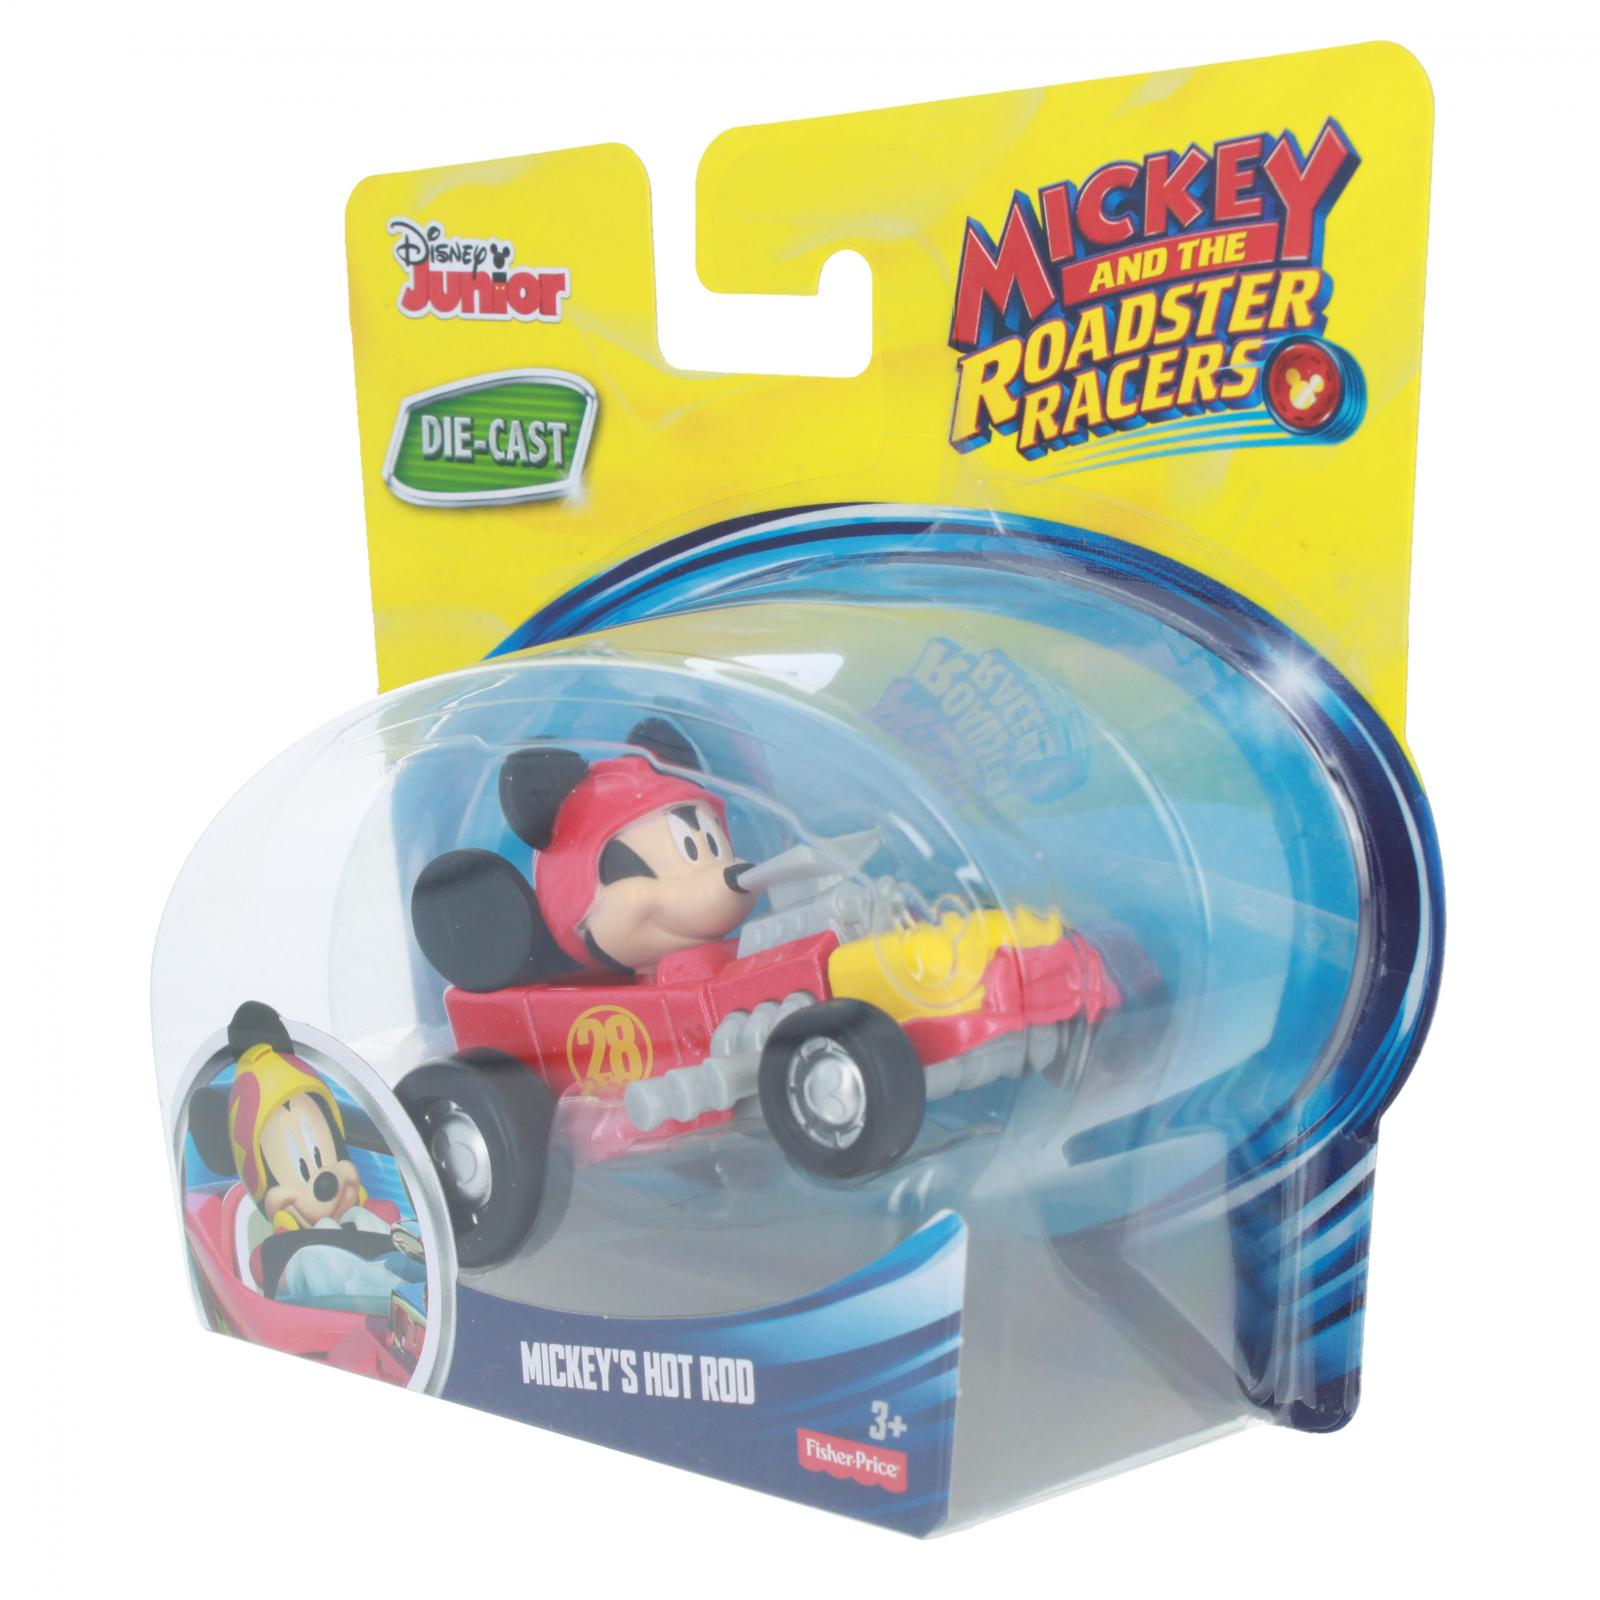 Disney Mickey Mouse Roadster Racer Die-cast Figure Hot Rod